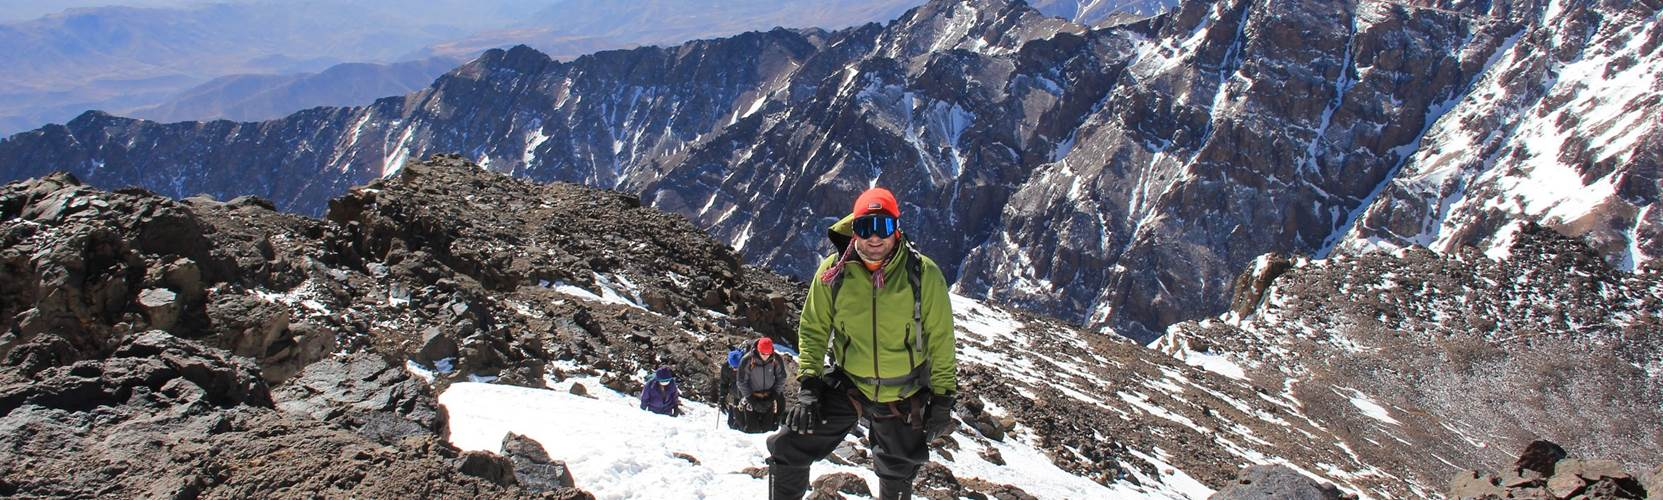 trekking and climbing in the atlas mountains adventure alternative